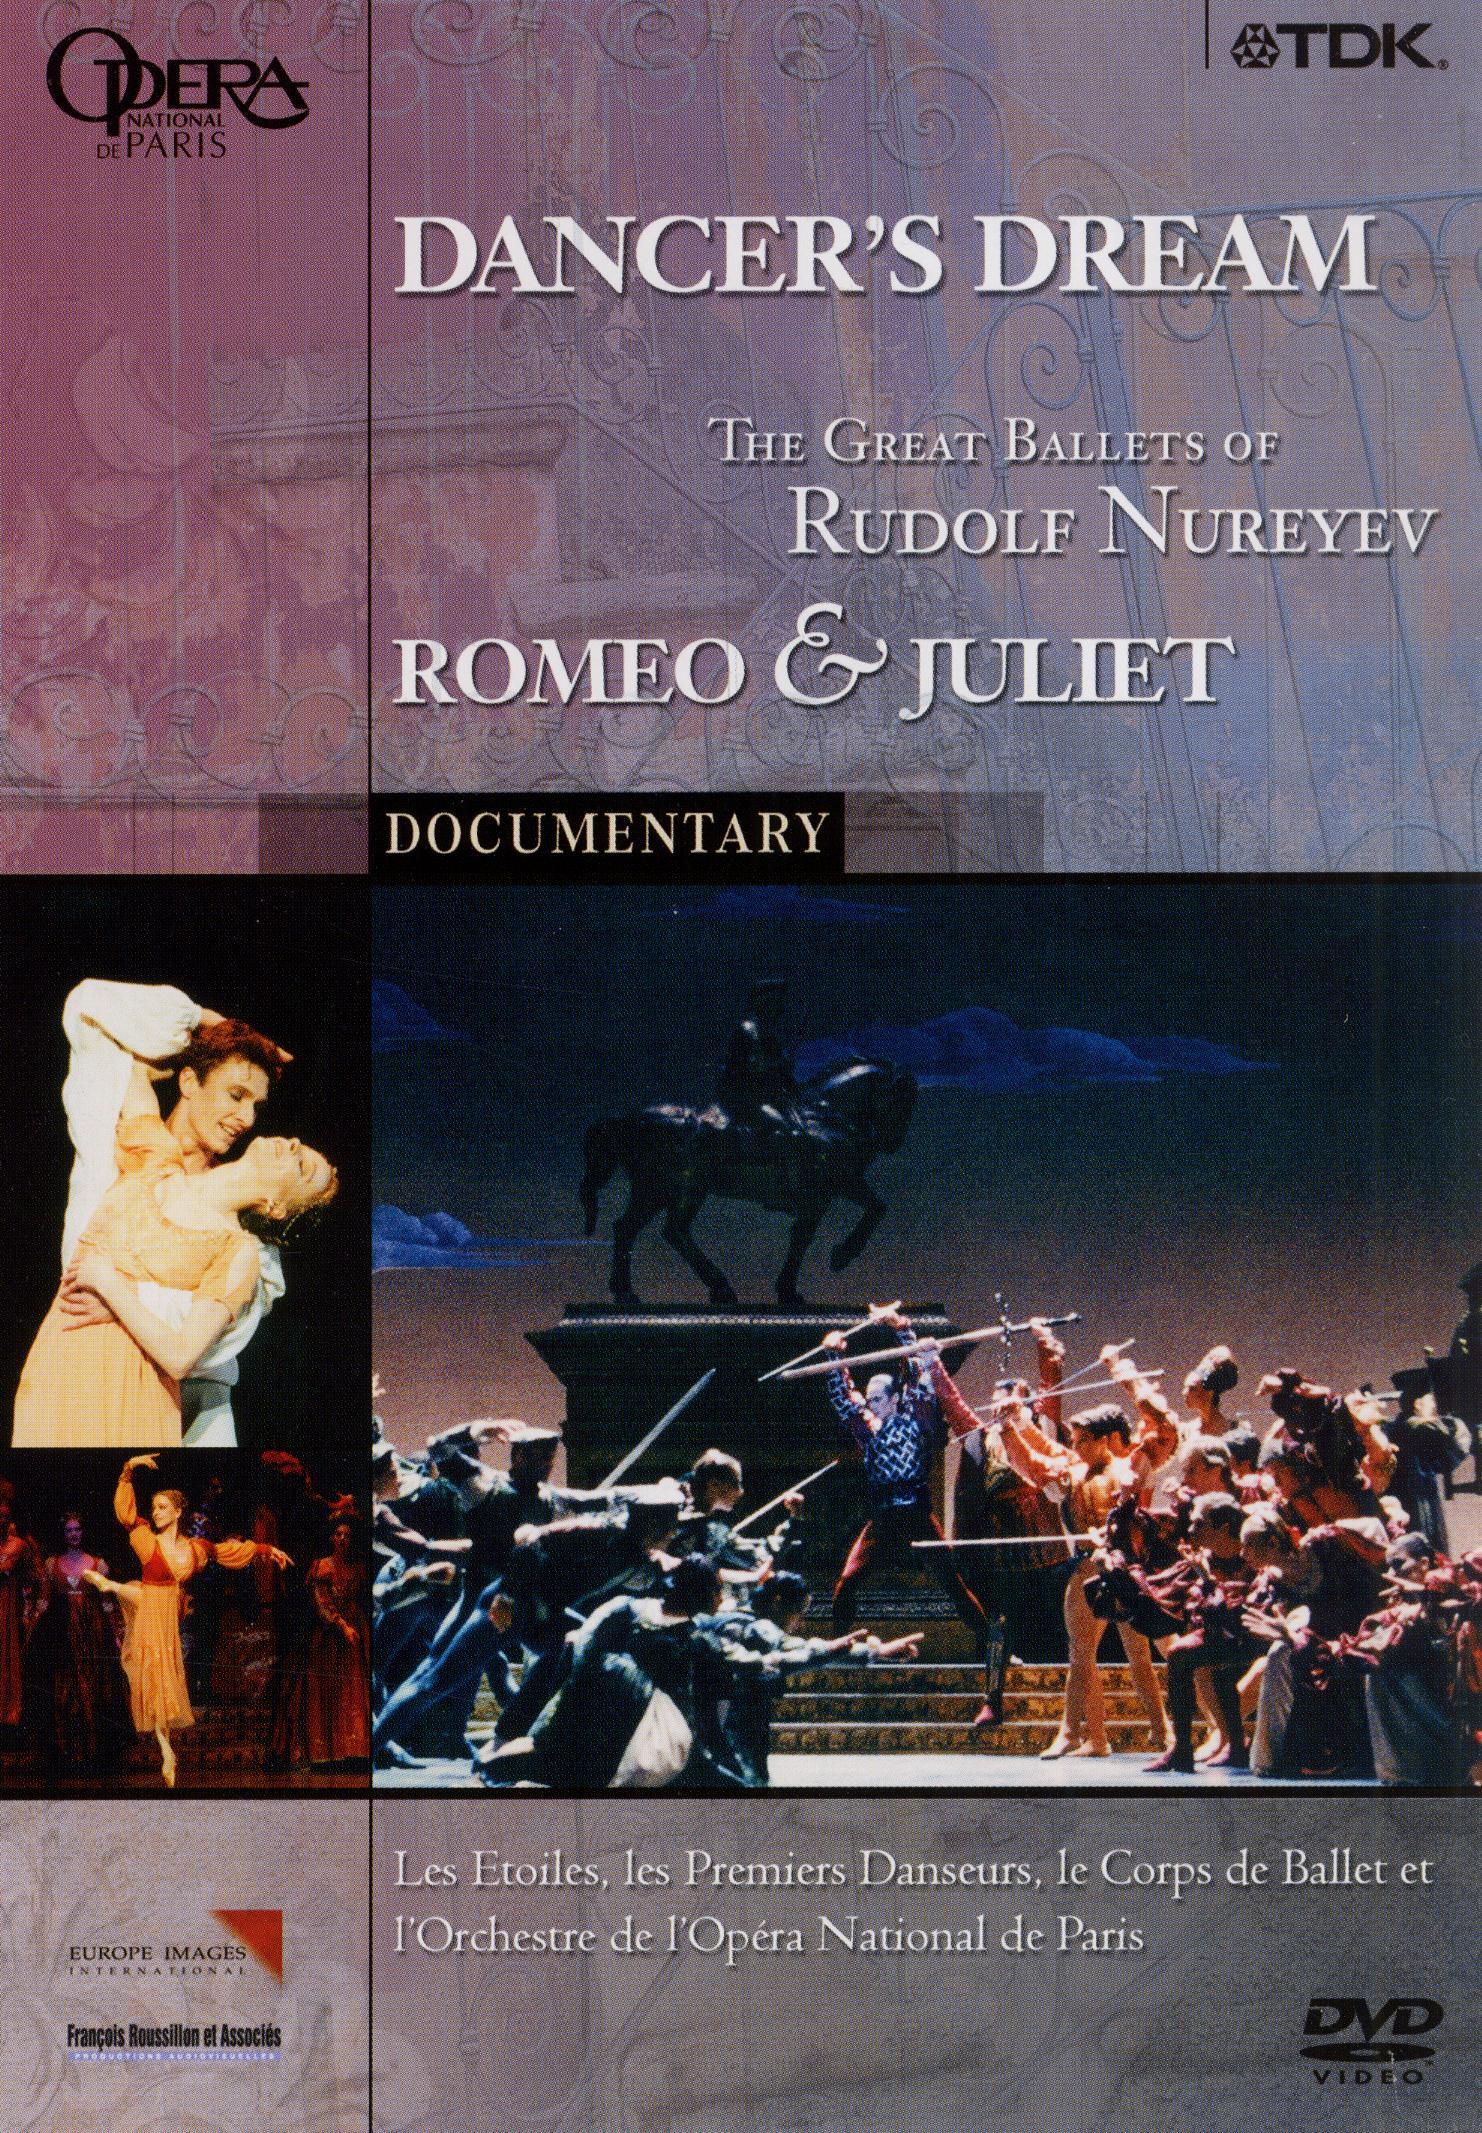 Dancer's Dream: The Great Ballets of Rudolf Nureyev - Romeo & Juliet